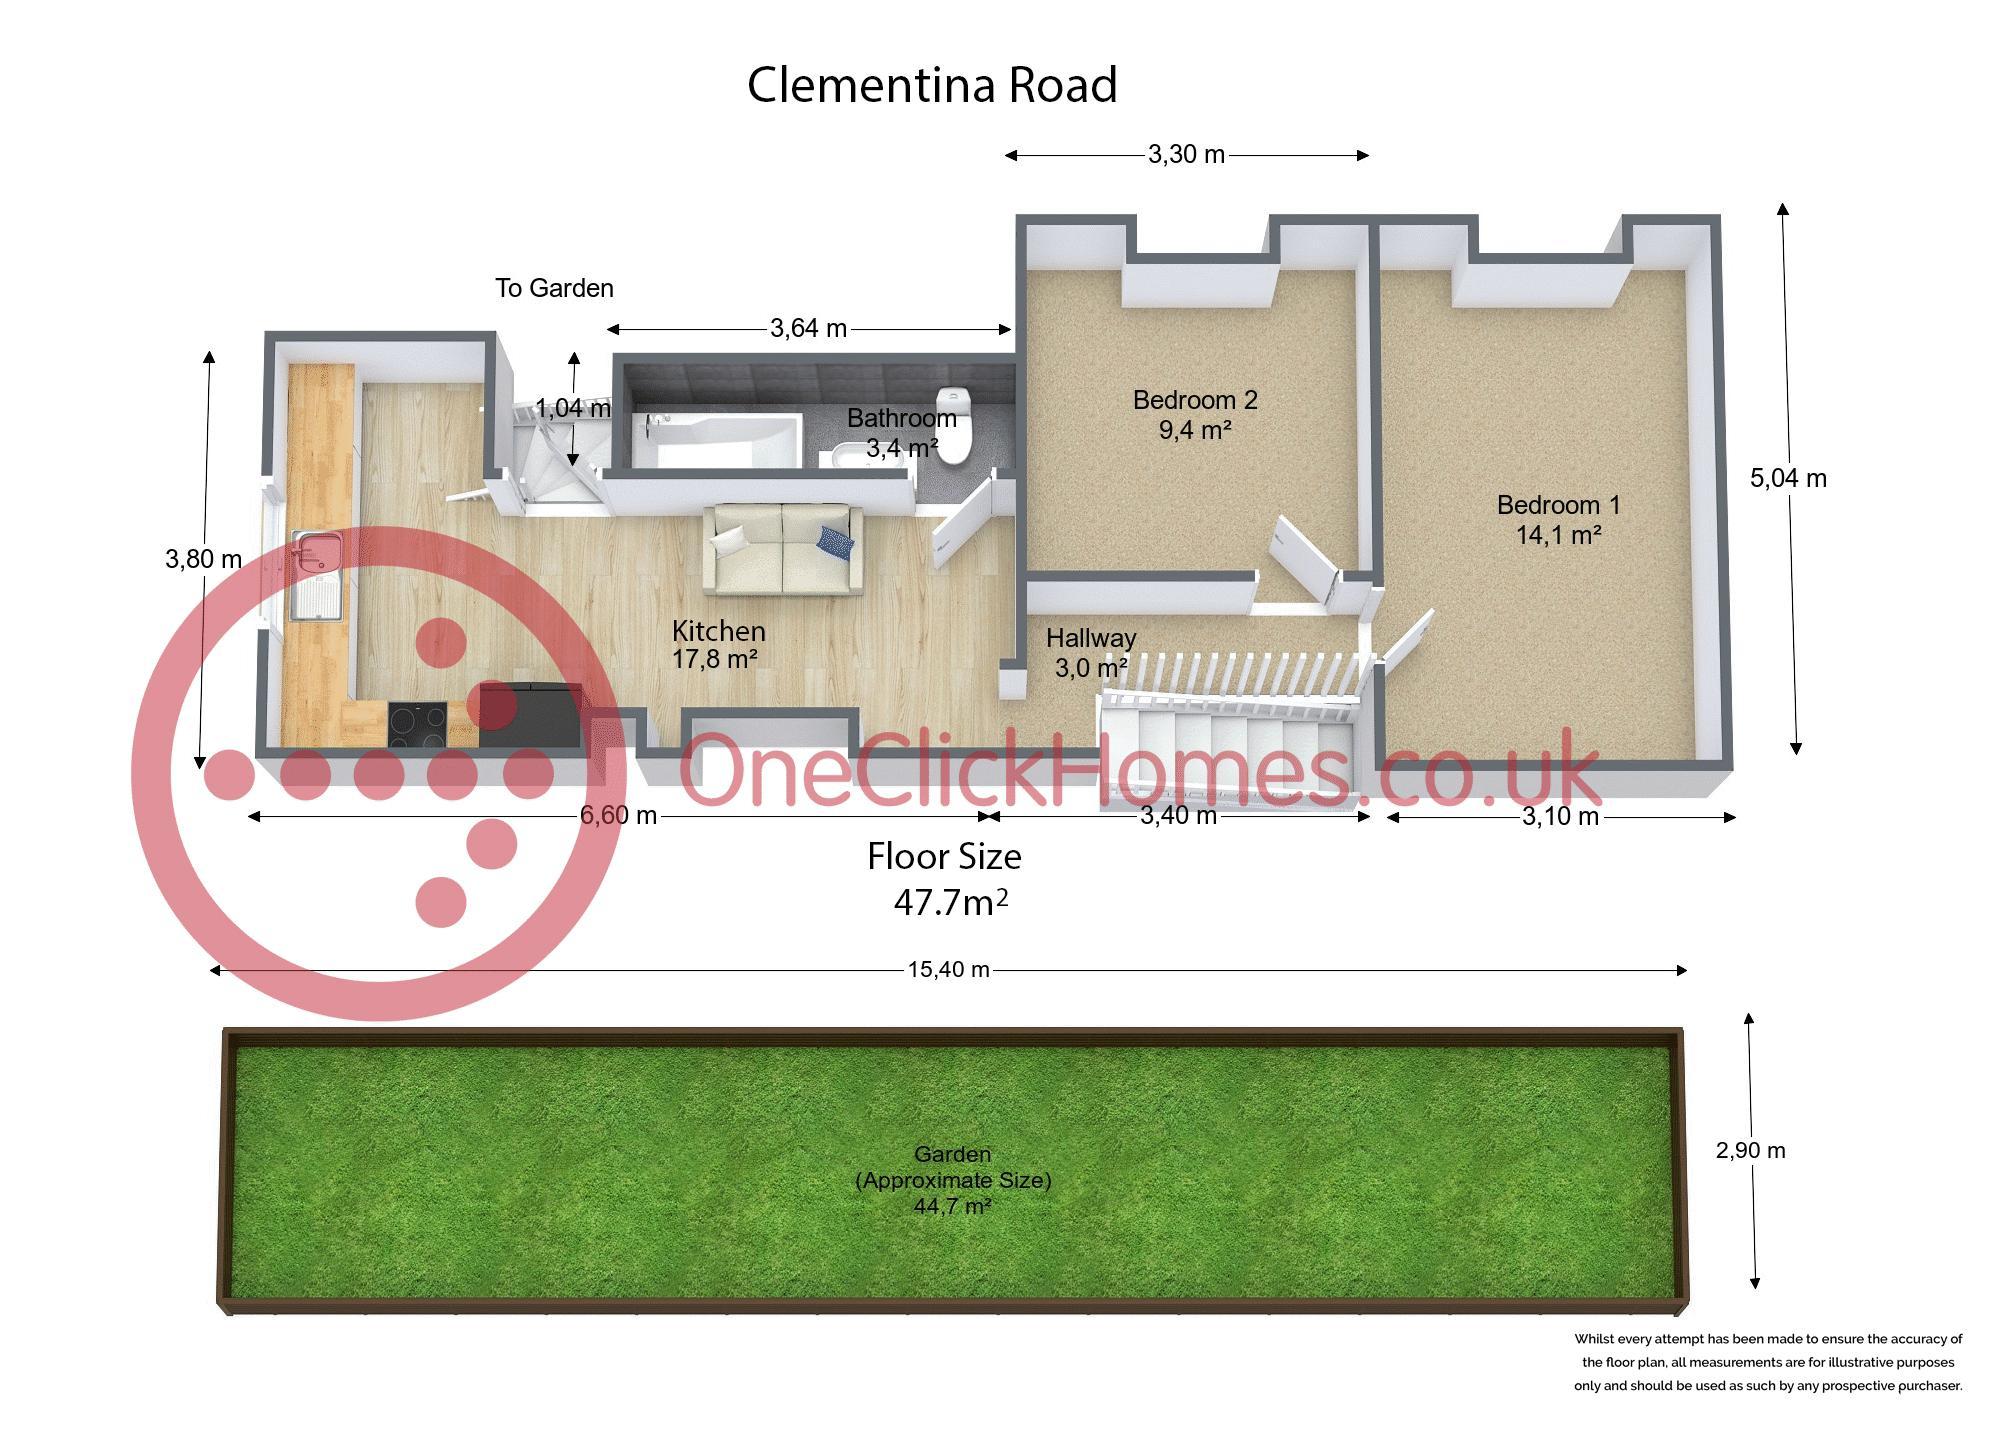 Clementina Road